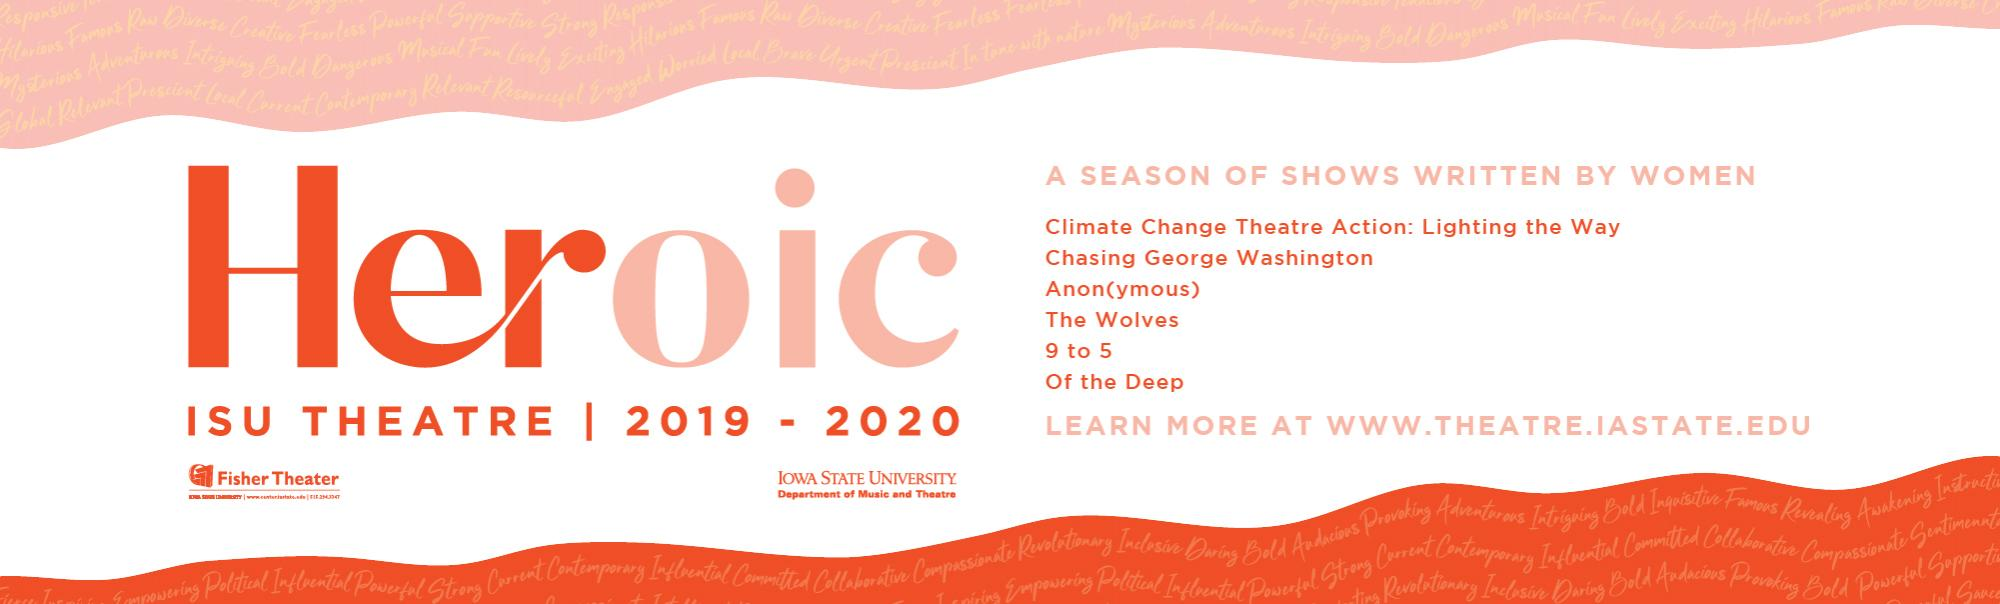 Heroic ISU Theatre 2019-20 Season